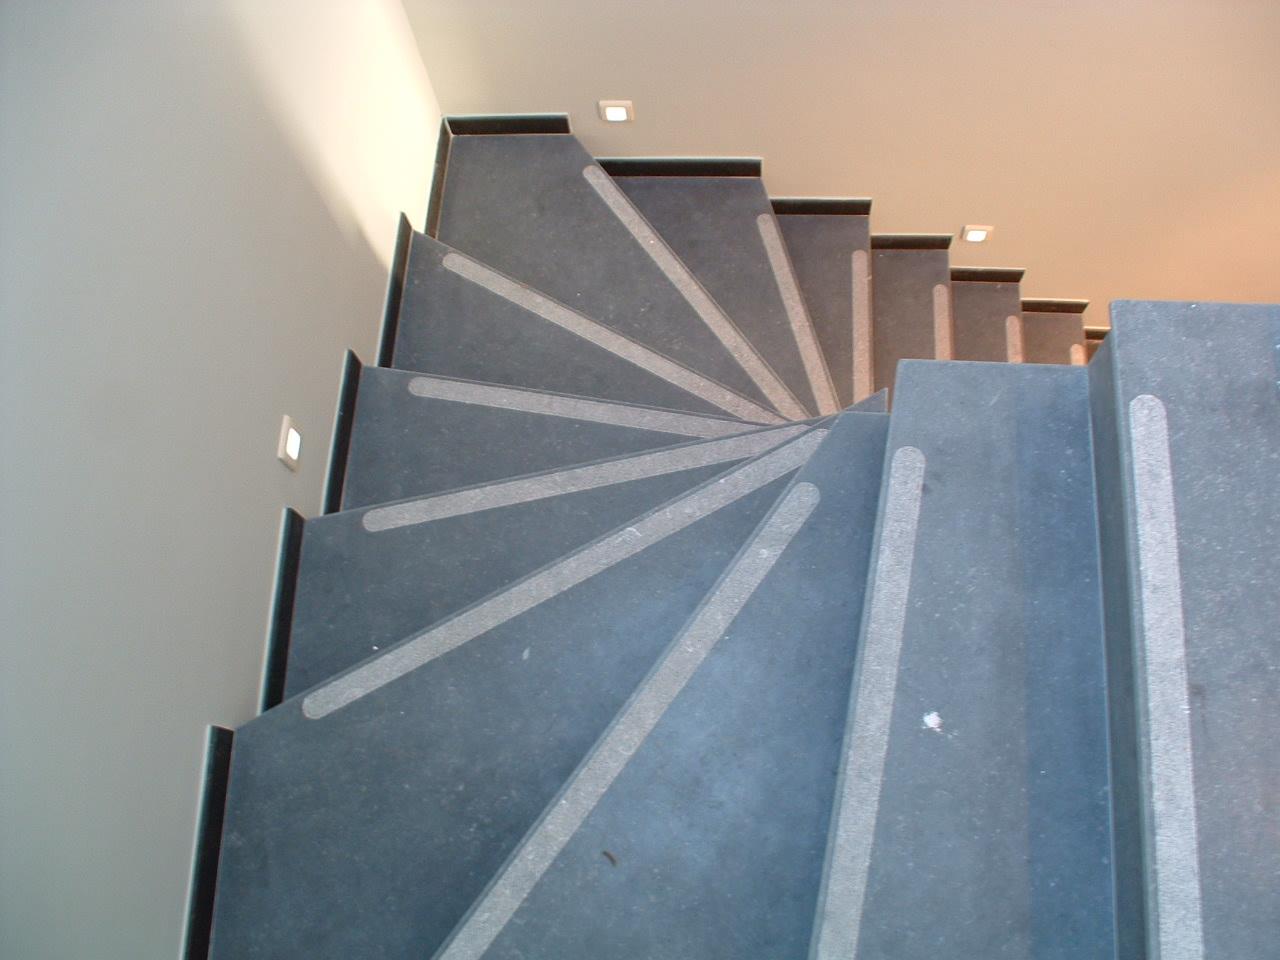 escalier meul i antid rapant bouchard pierre bleue belge. Black Bedroom Furniture Sets. Home Design Ideas